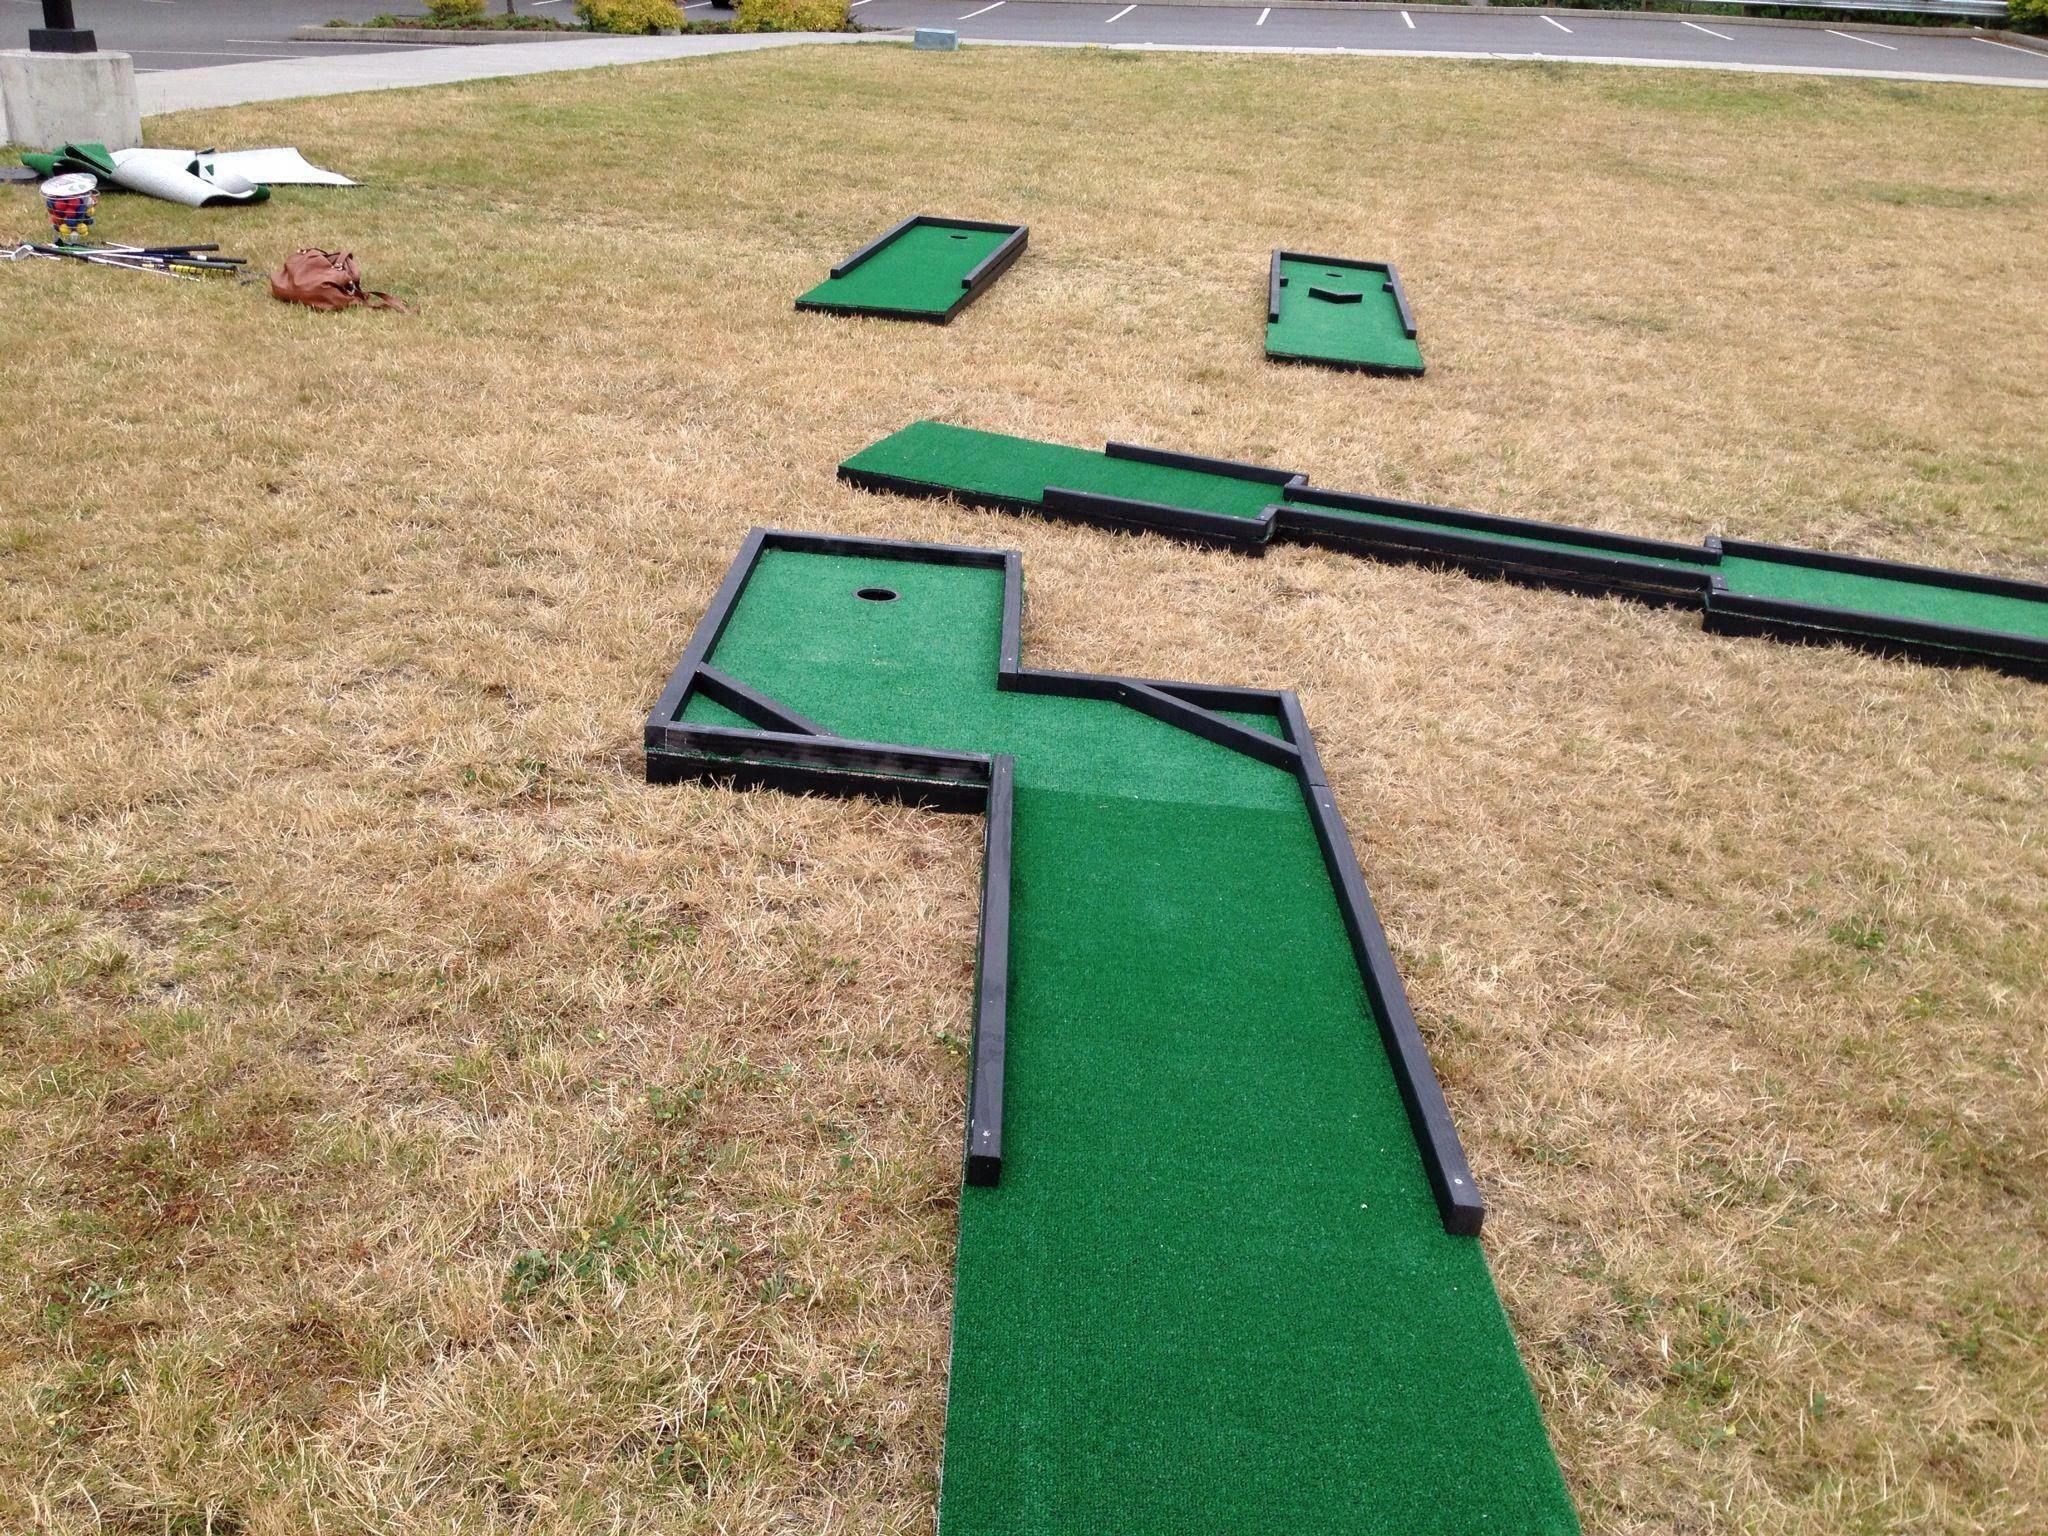 Golf Swing Tips Video Youtube Bestgolftipsforhighhandicappers Id 6782373730 Golfcardgame Miniature Golf Course Mini Golf Set Dubai Golf